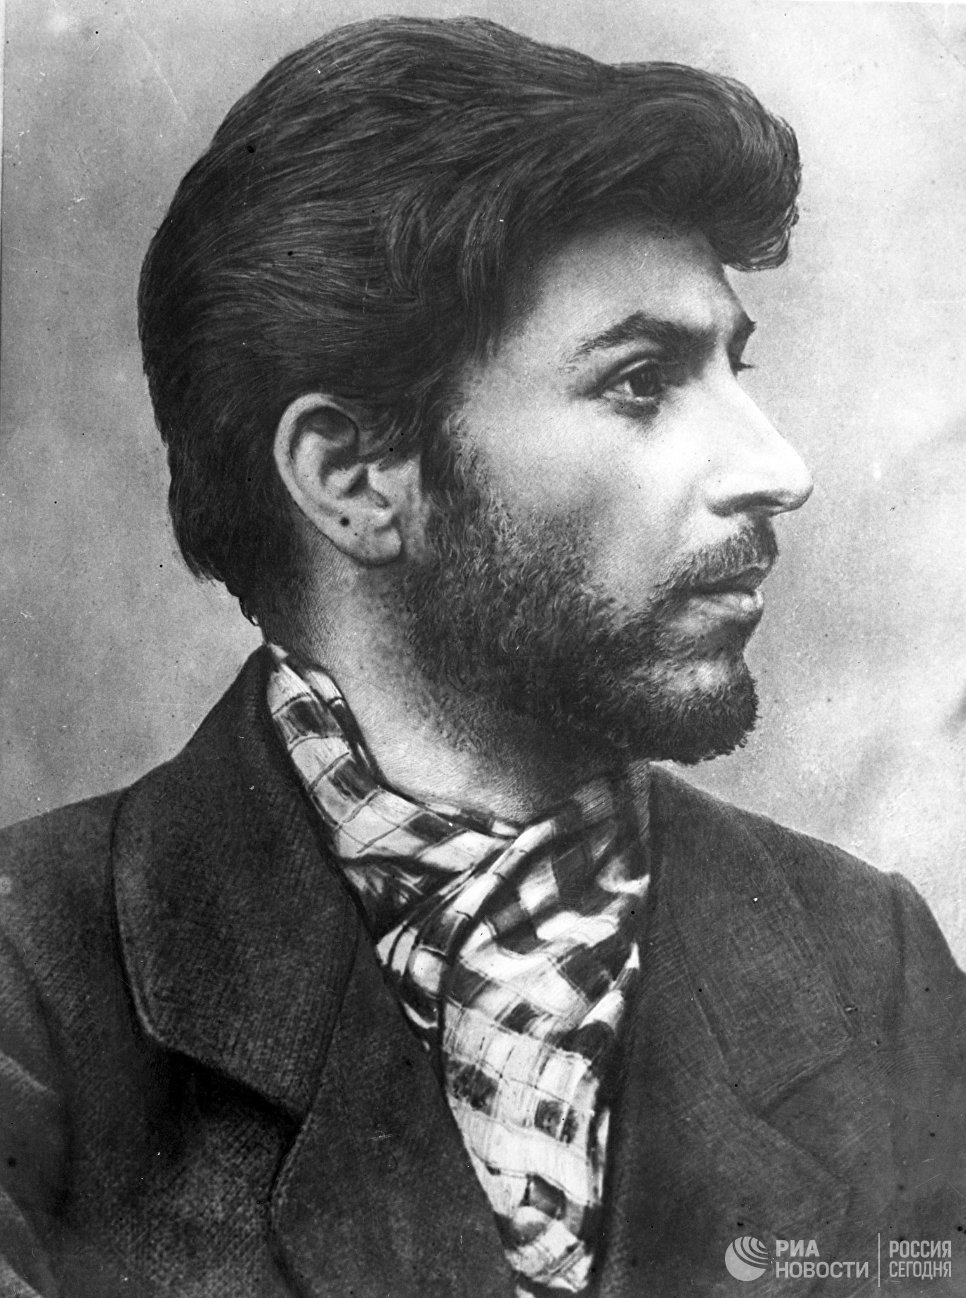 Юмор вождя: как шутил Иосиф Сталин